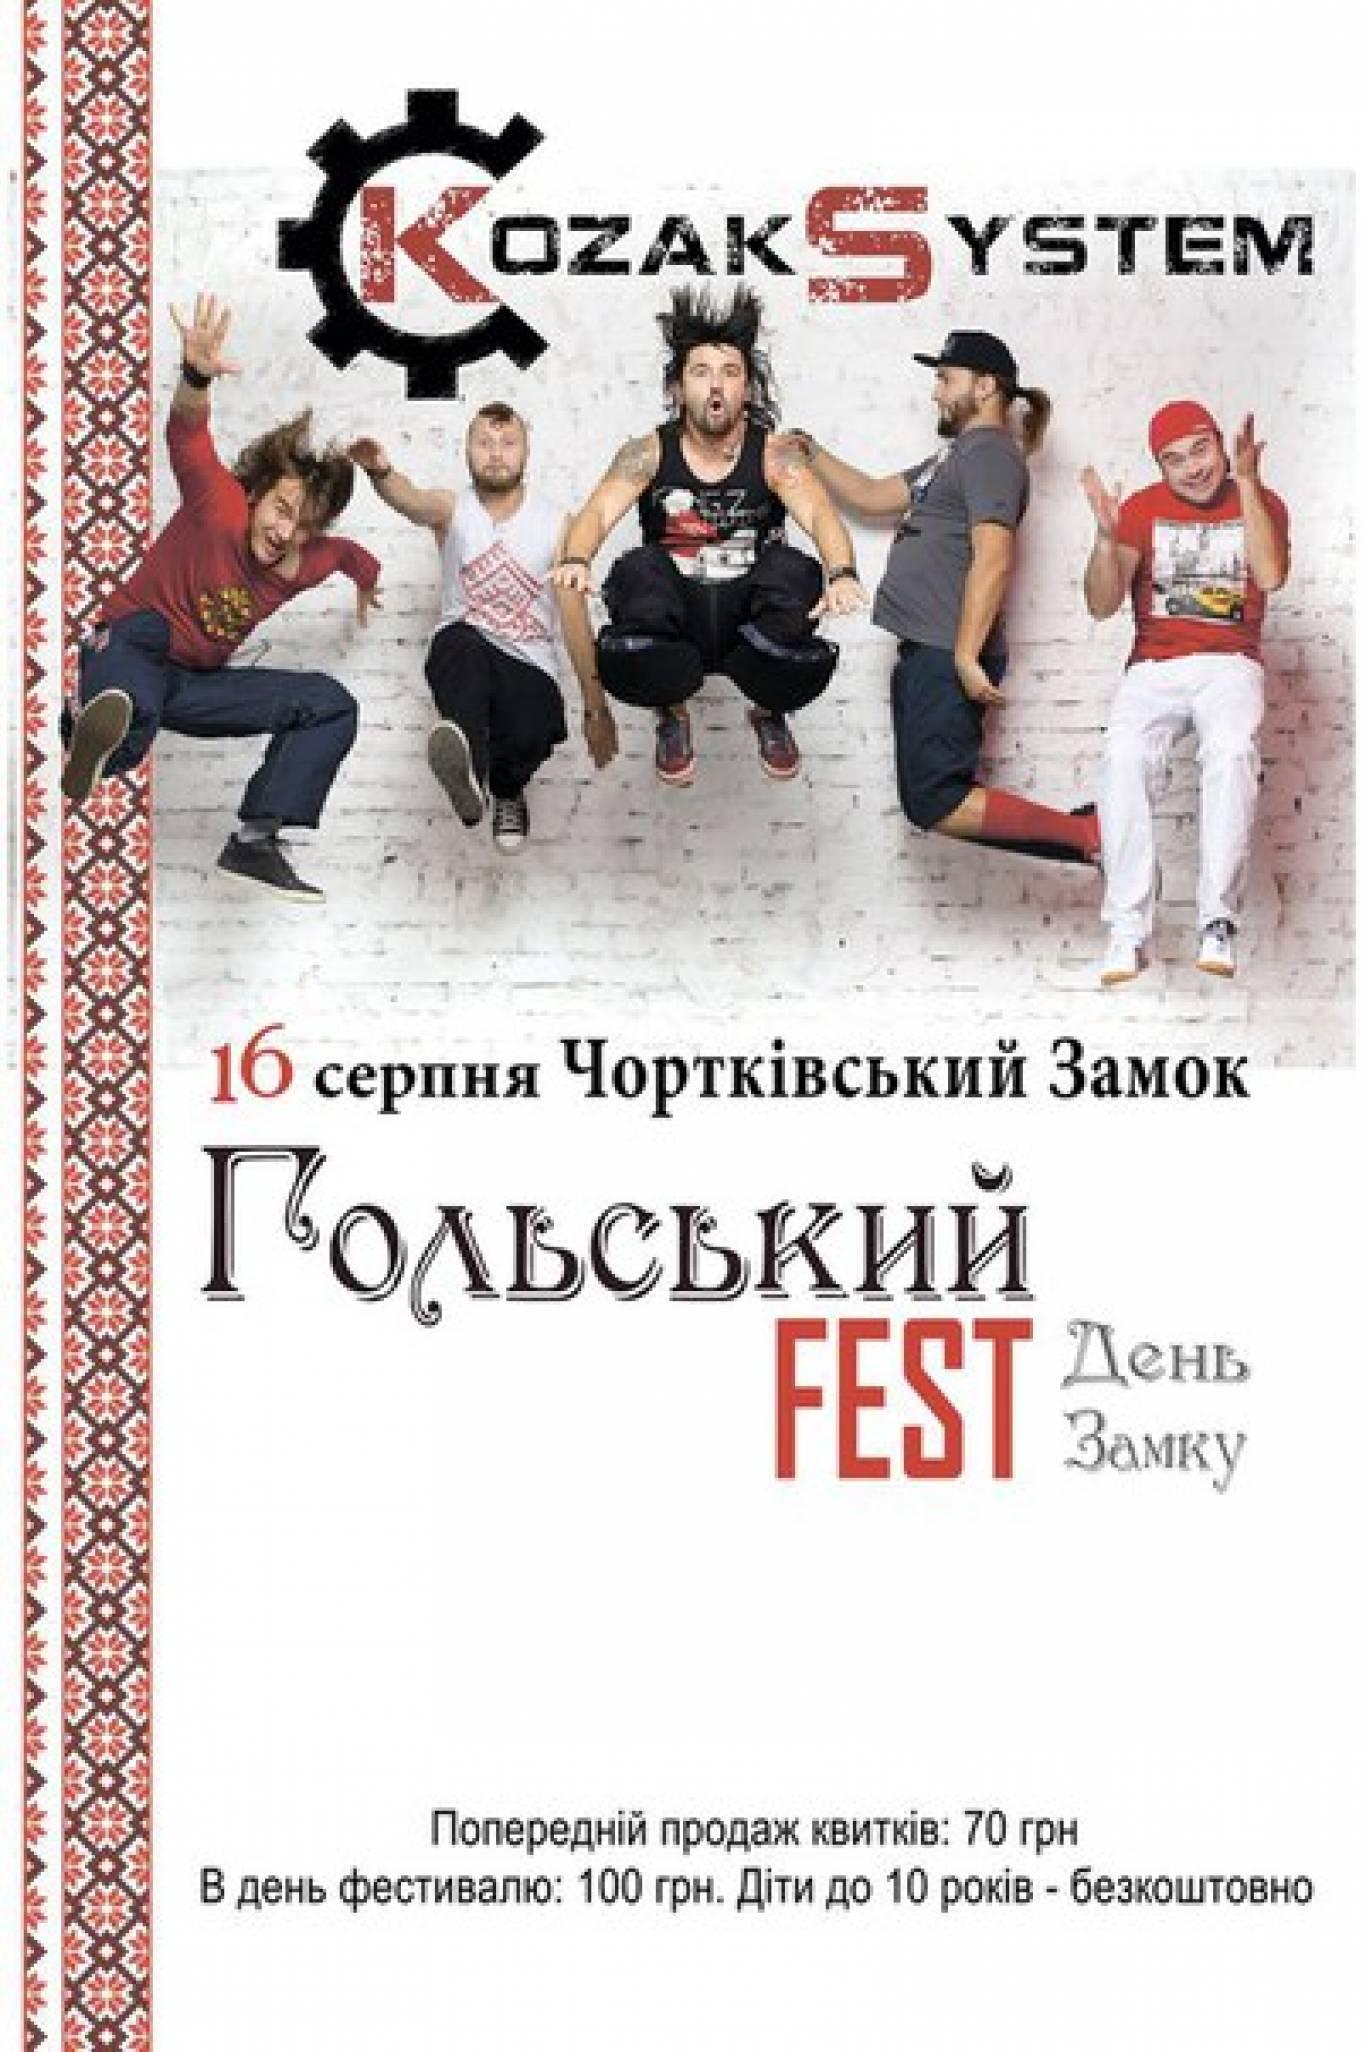 Гольський Fest